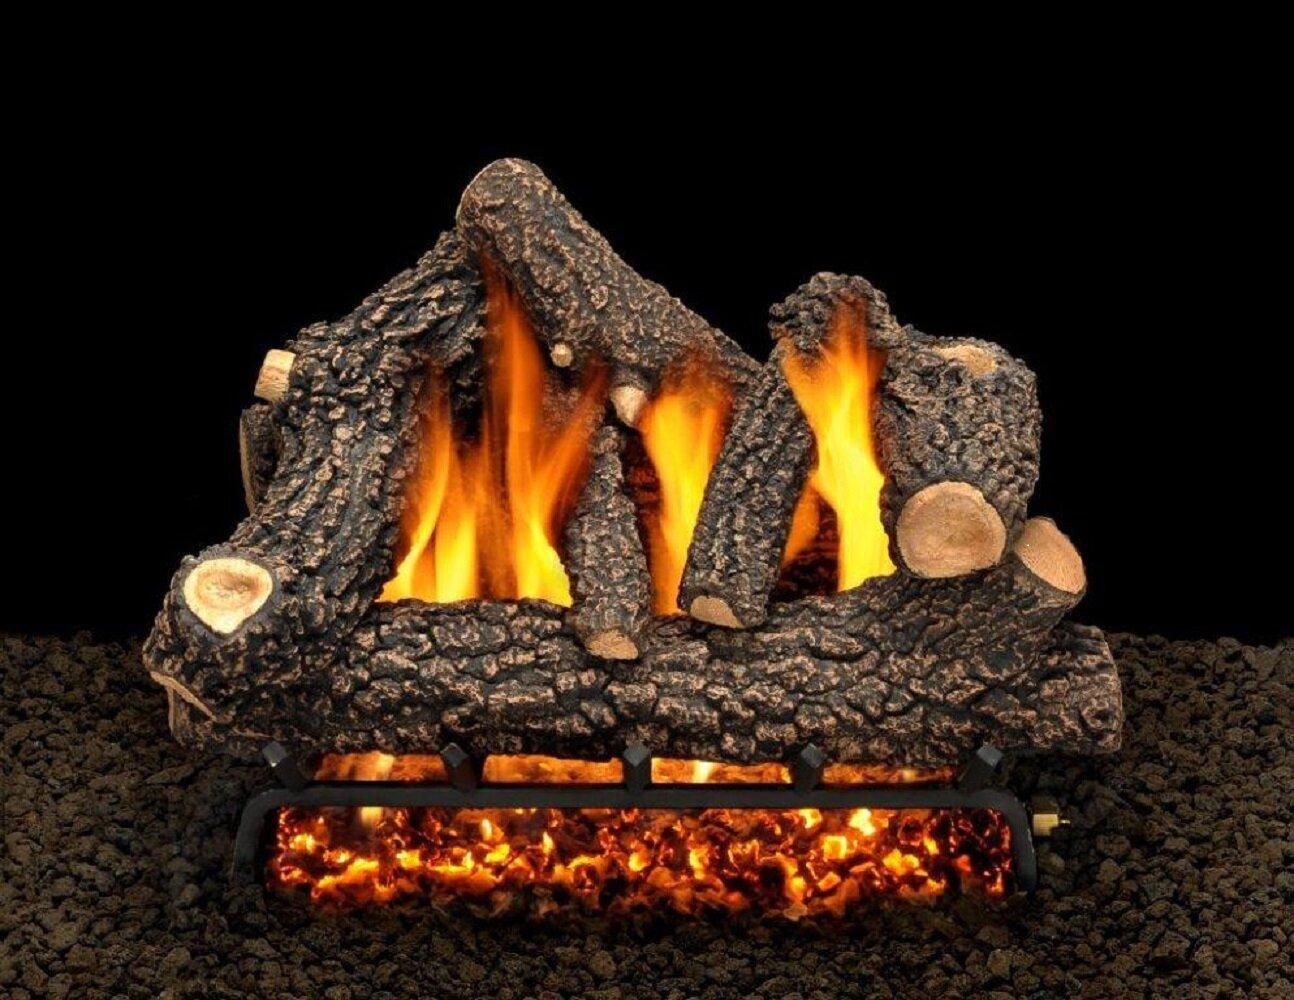 American Gas Log Cheyenne Glow Vented Propane Natural Gas